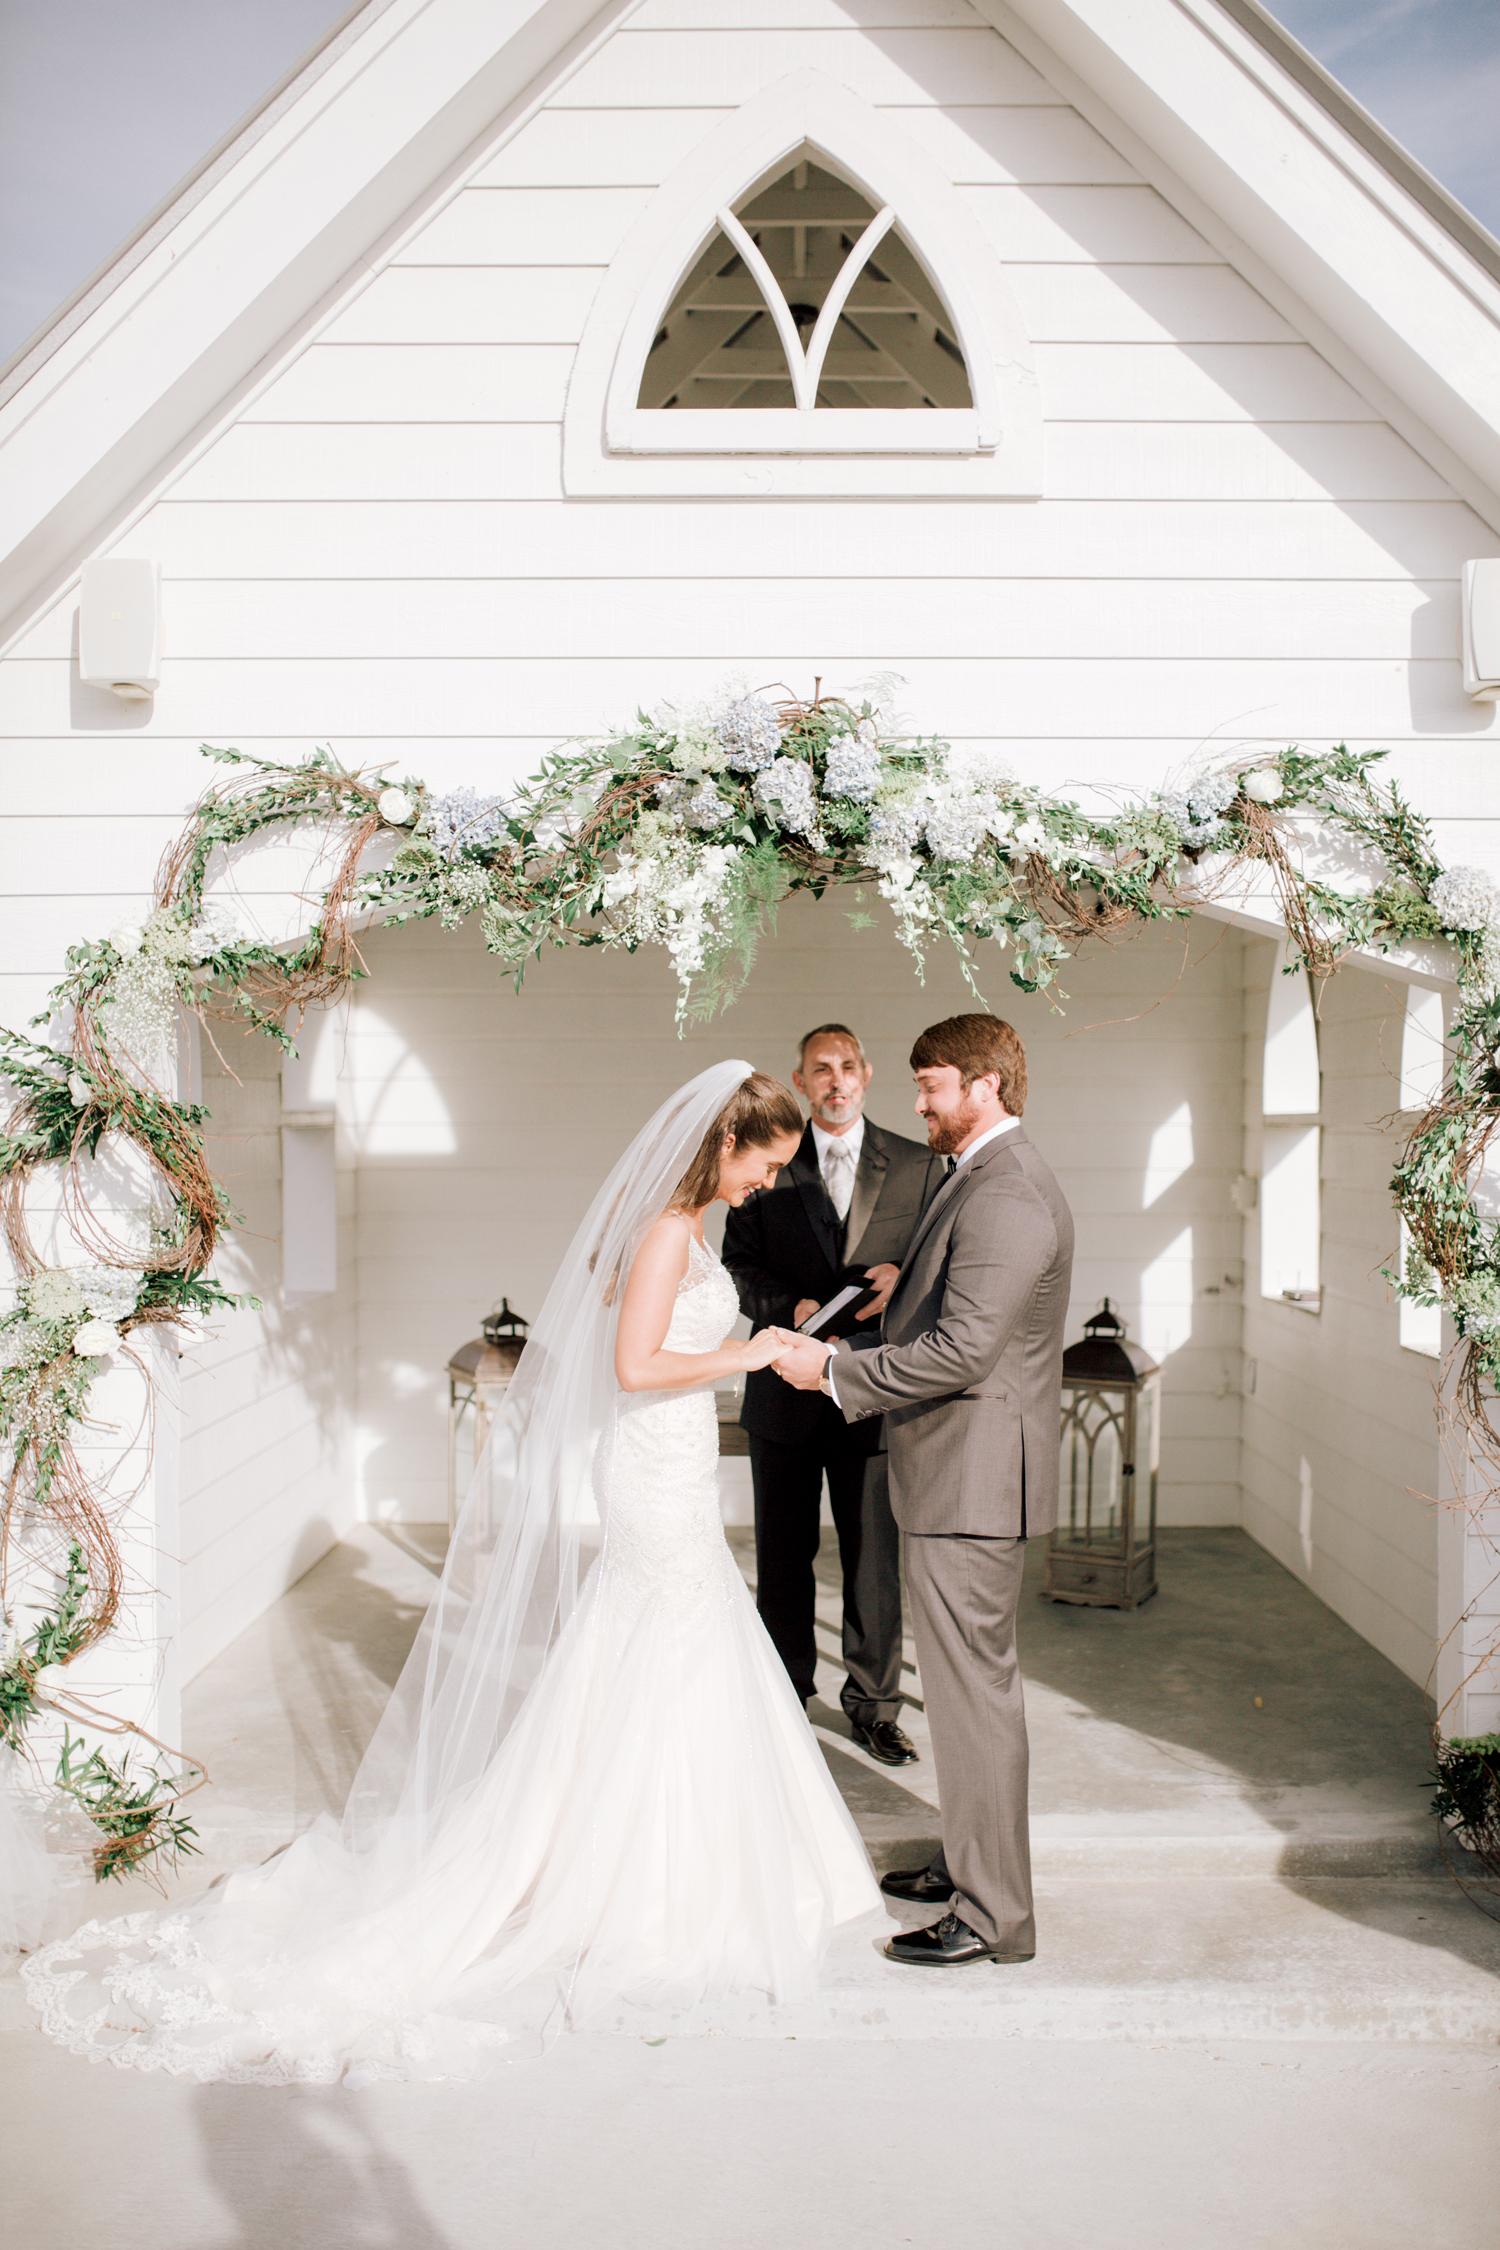 alaa-marzouk-photography-rgvweddingphotographer-rio-grande-valley-mathis-wedding-bridal-bride-san-antonio-portrait-weddings-mcallen-106.jpg